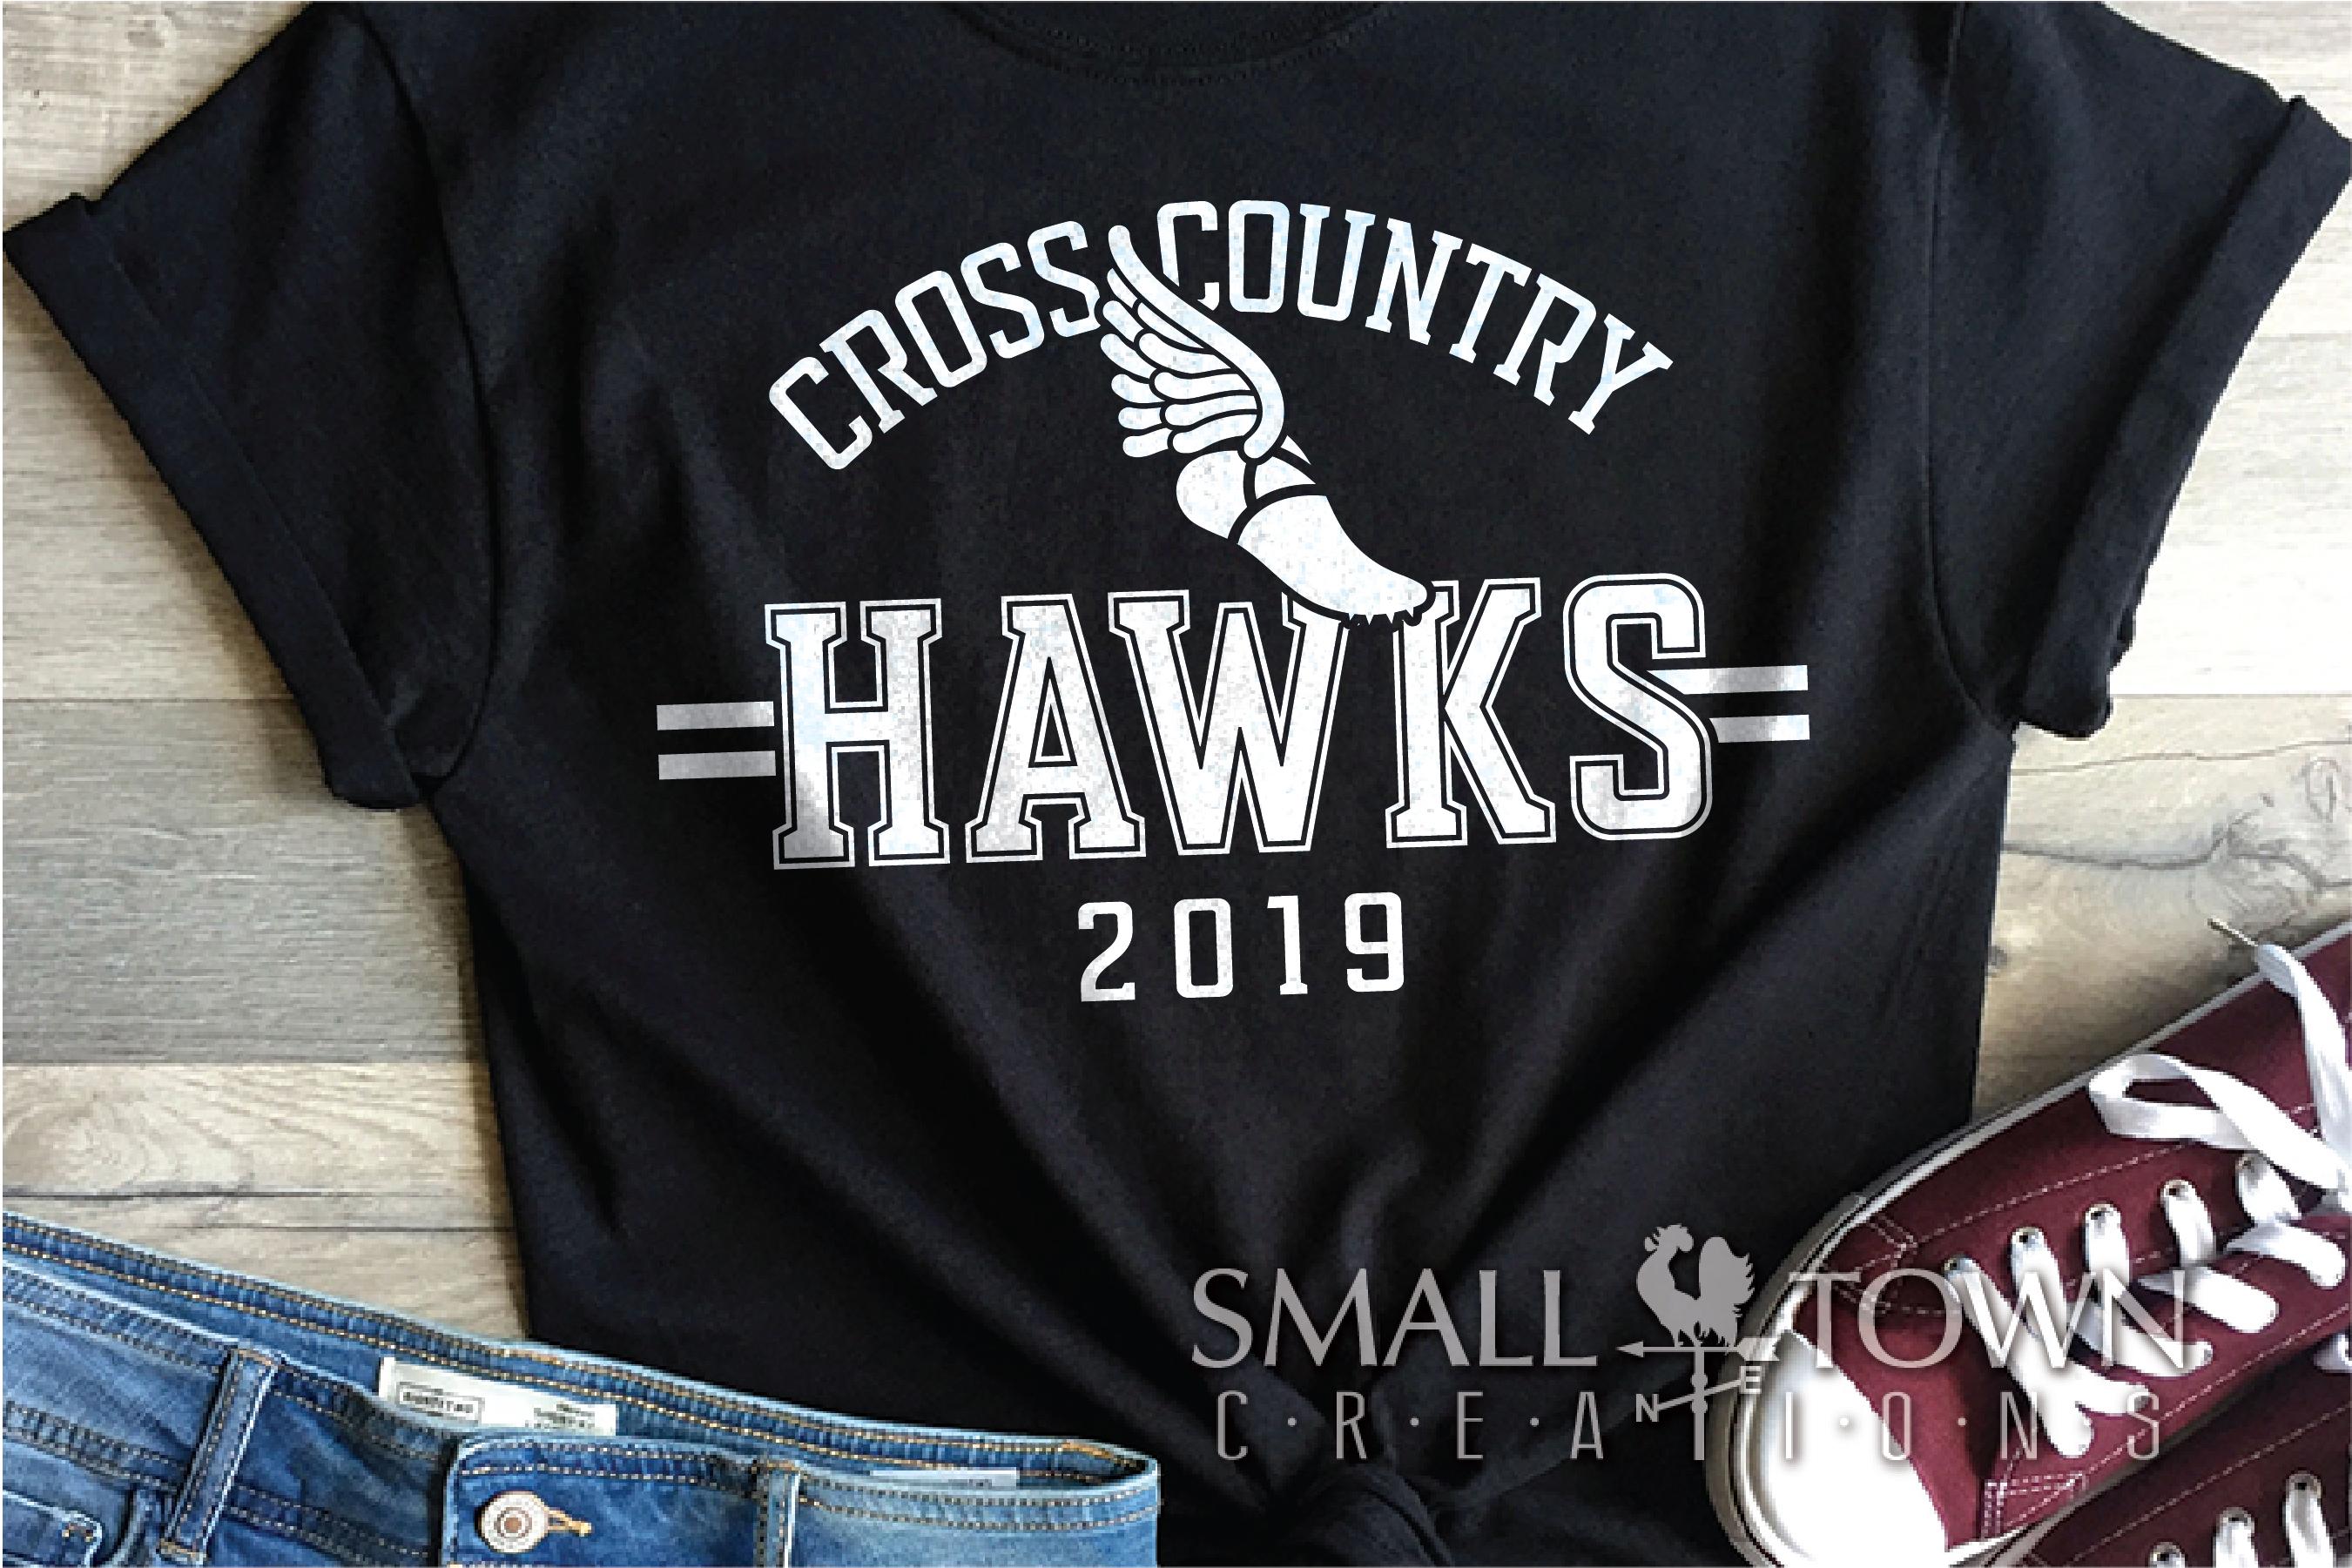 Hawks Cross Country Team, Hawk Mascot, PRINT, CUT & DESIGN example image 1